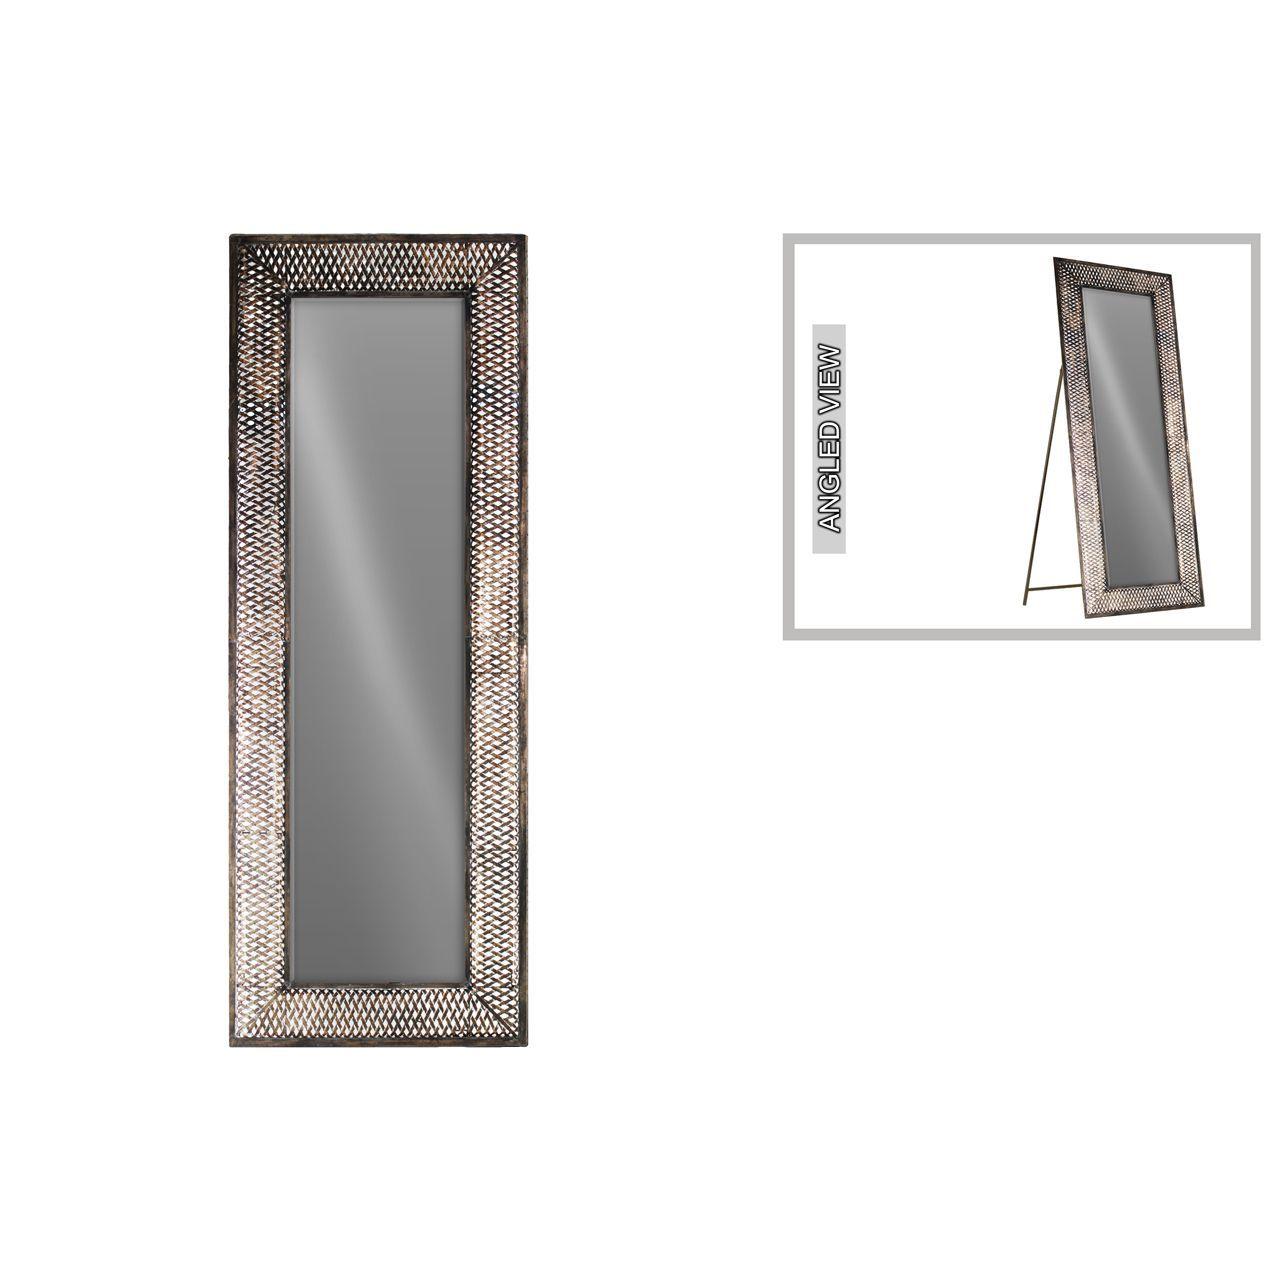 Urban Trends Collection Tarnished Bronze-finish Metal Rectangular ...